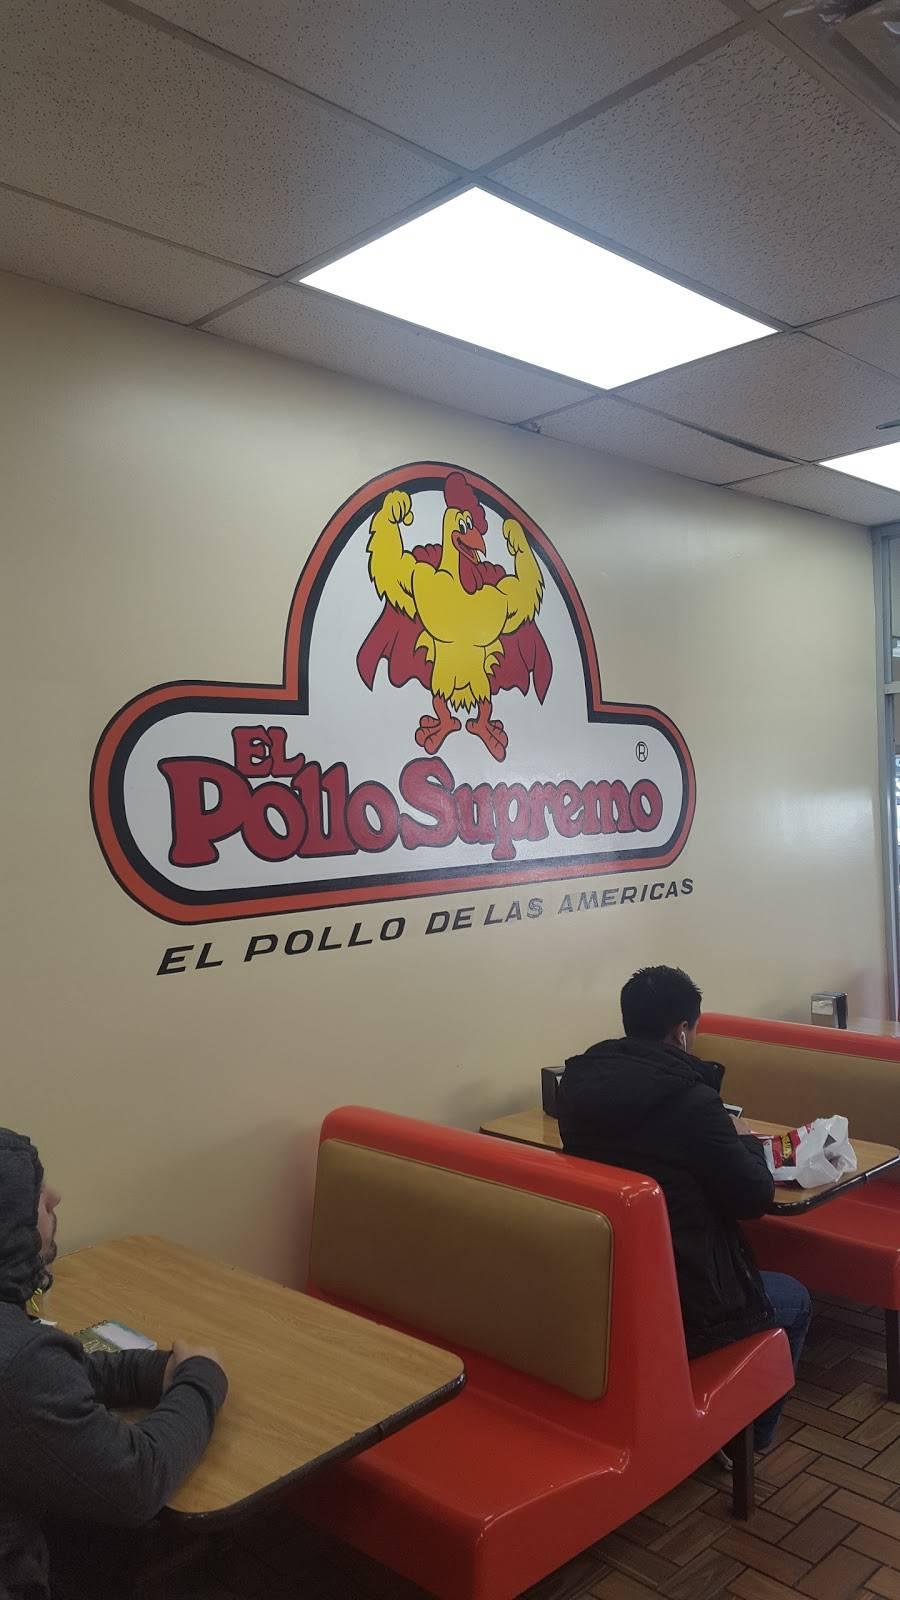 El Pollo Supremo | restaurant | 6114 Bergenline Ave, West New York, NJ 07093, USA | 2018689284 OR +1 201-868-9284